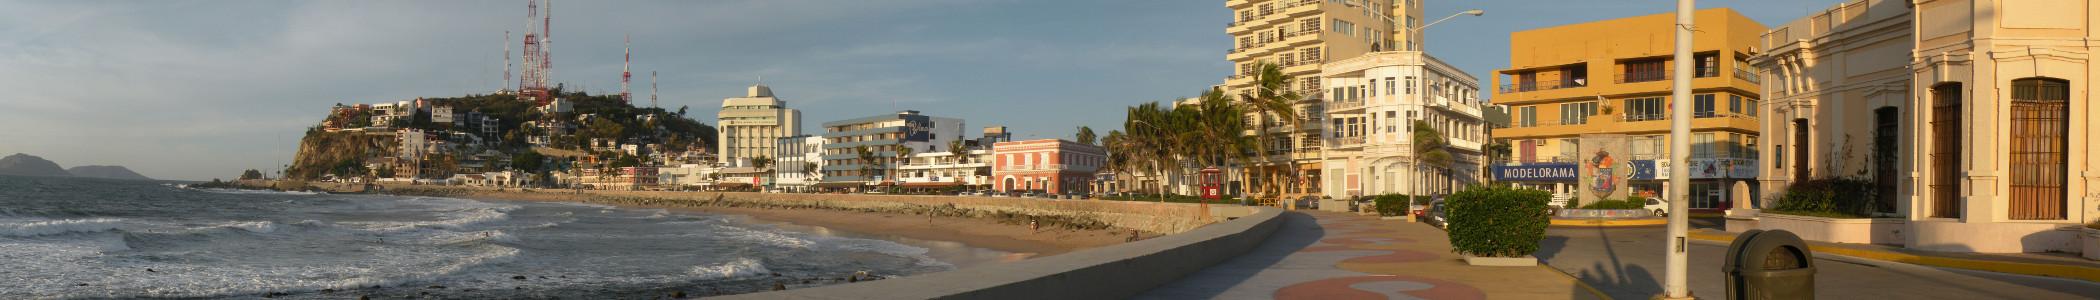 Sinaloa – Travel guide at Wikivoyage